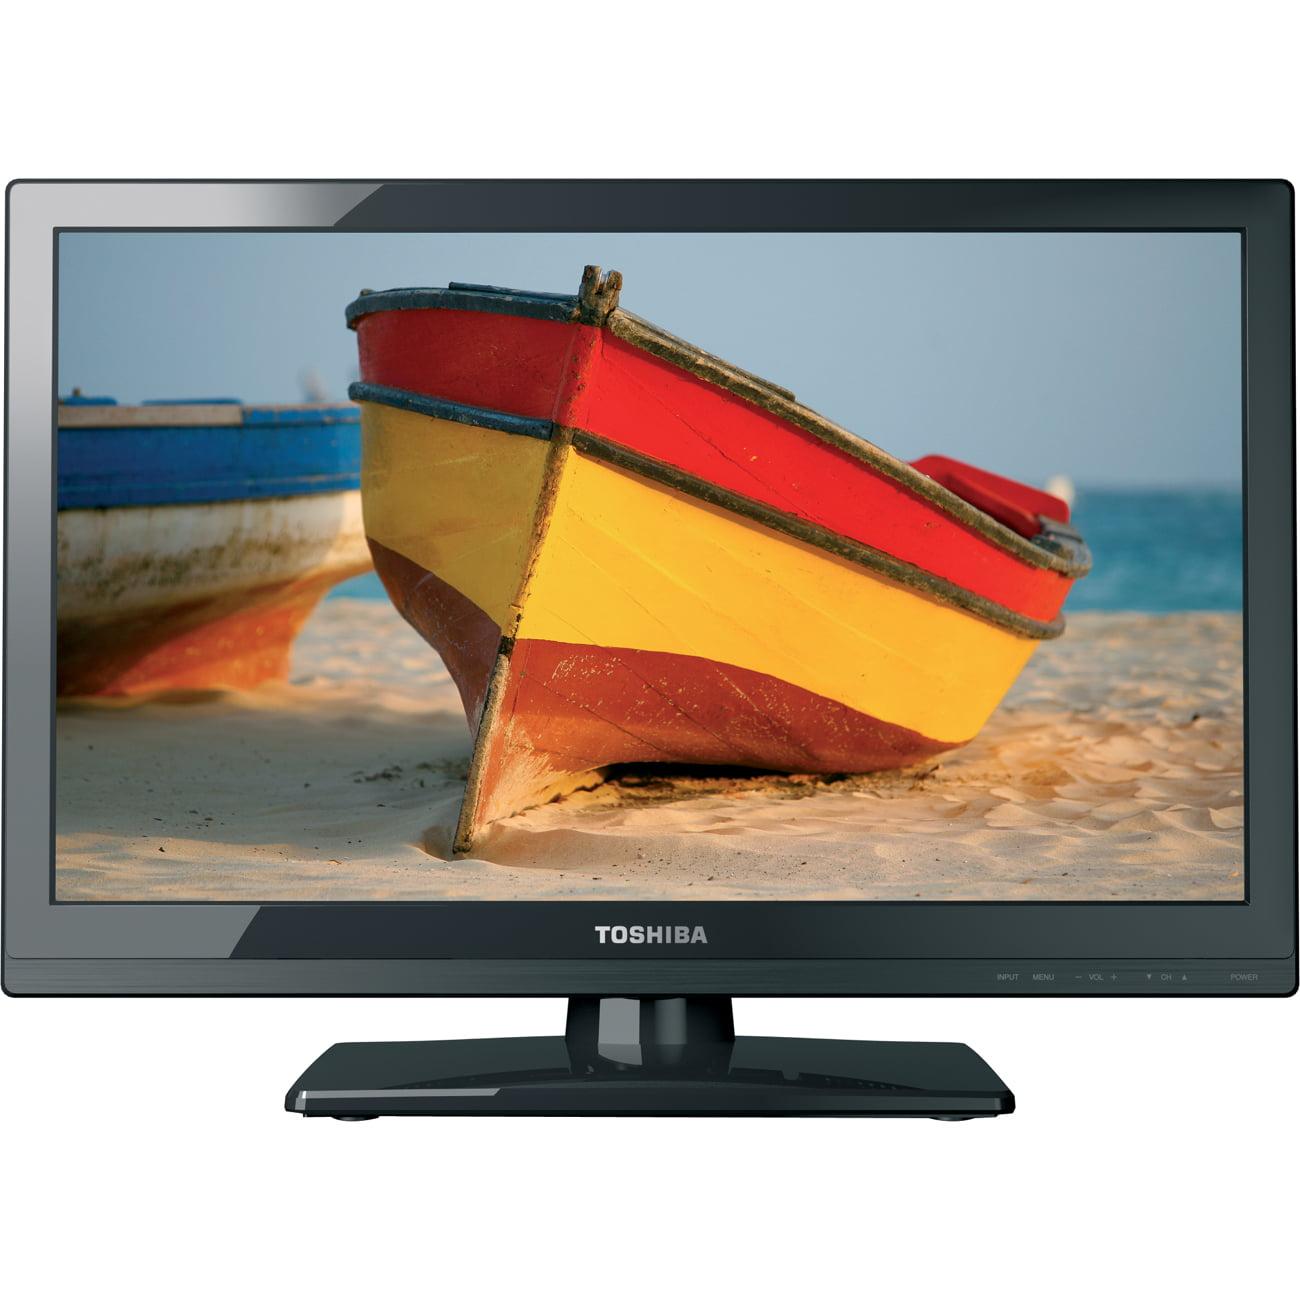 "Toshiba 24"" Class LED 1080p 60Hz HDTV, 1.85"" ultra slim, 24SL410U"